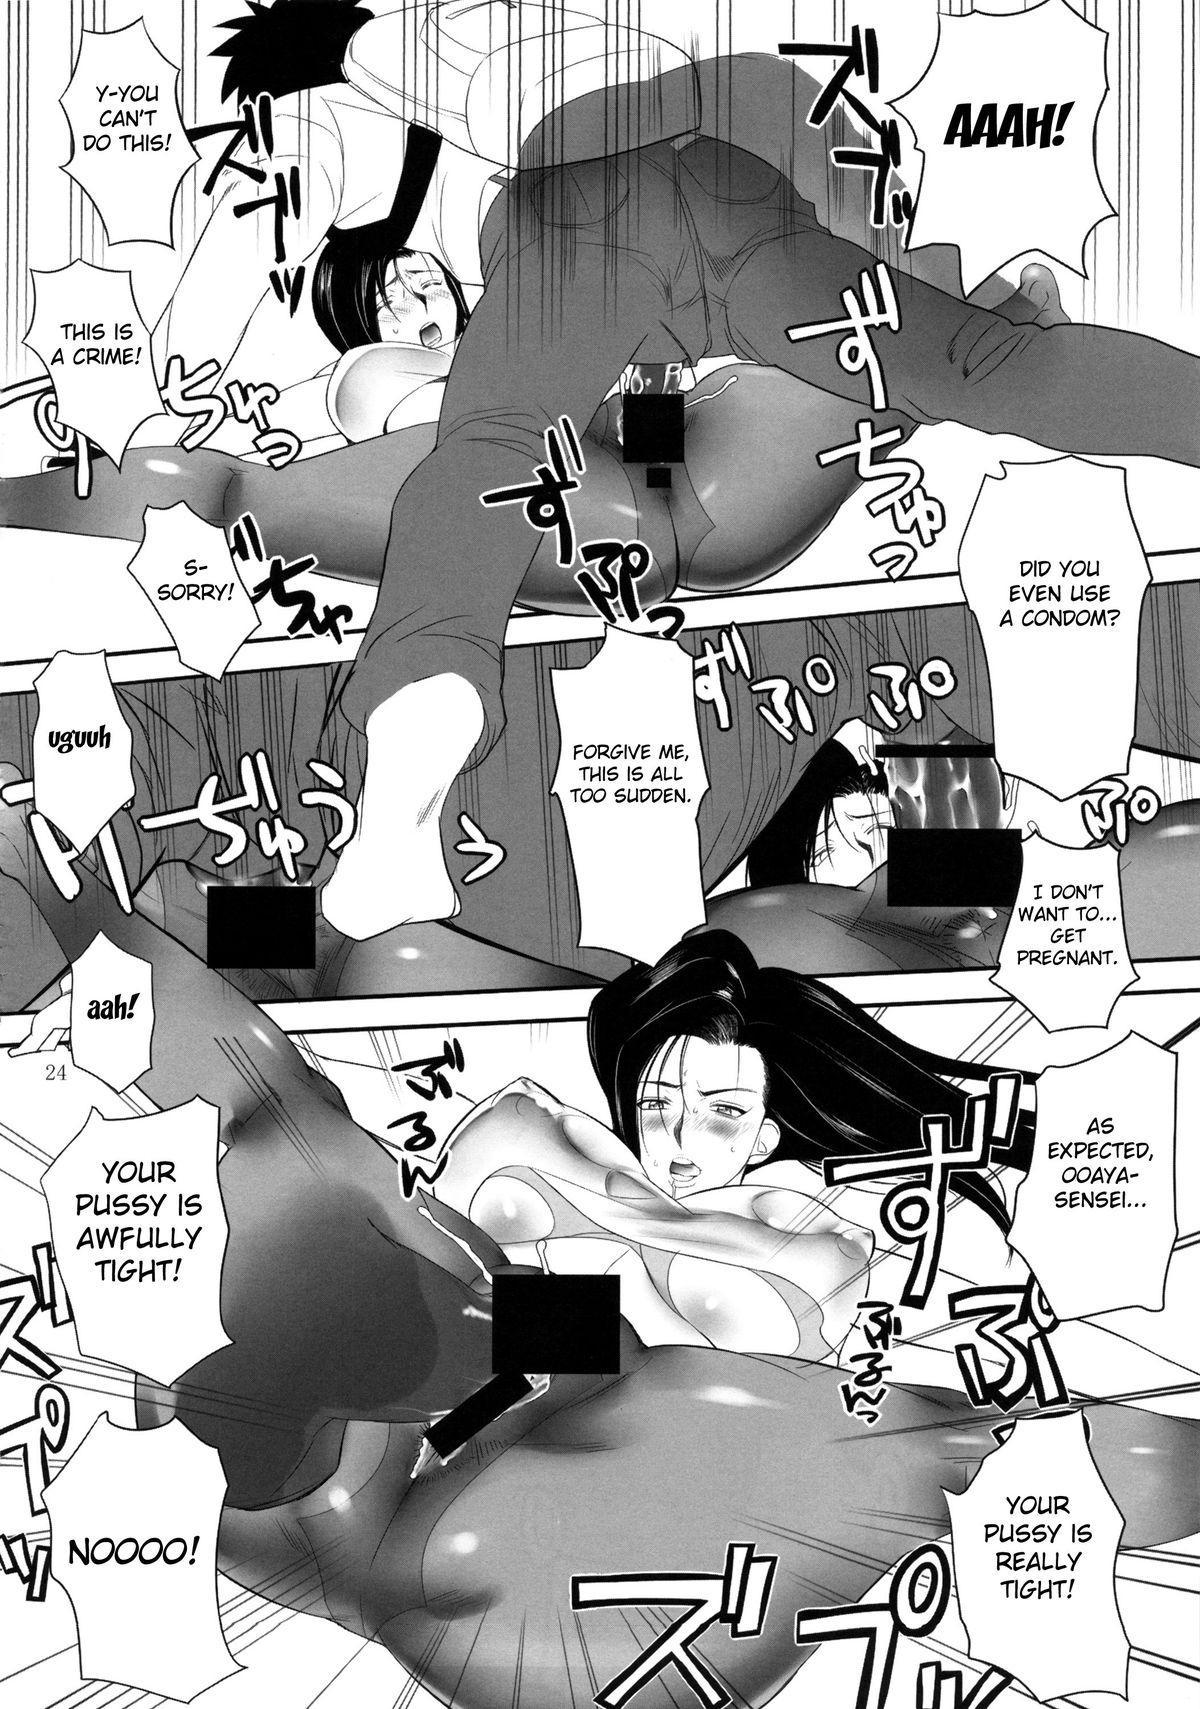 (COMIC1☆8) [G-panda (Midoh Tsukasa)] Maji kayo!? Ooaya-sensei   I Can't Believe It! Ooaya-sensei (Magical Taruruuto-kun) [English] {doujin-moe.us} 22